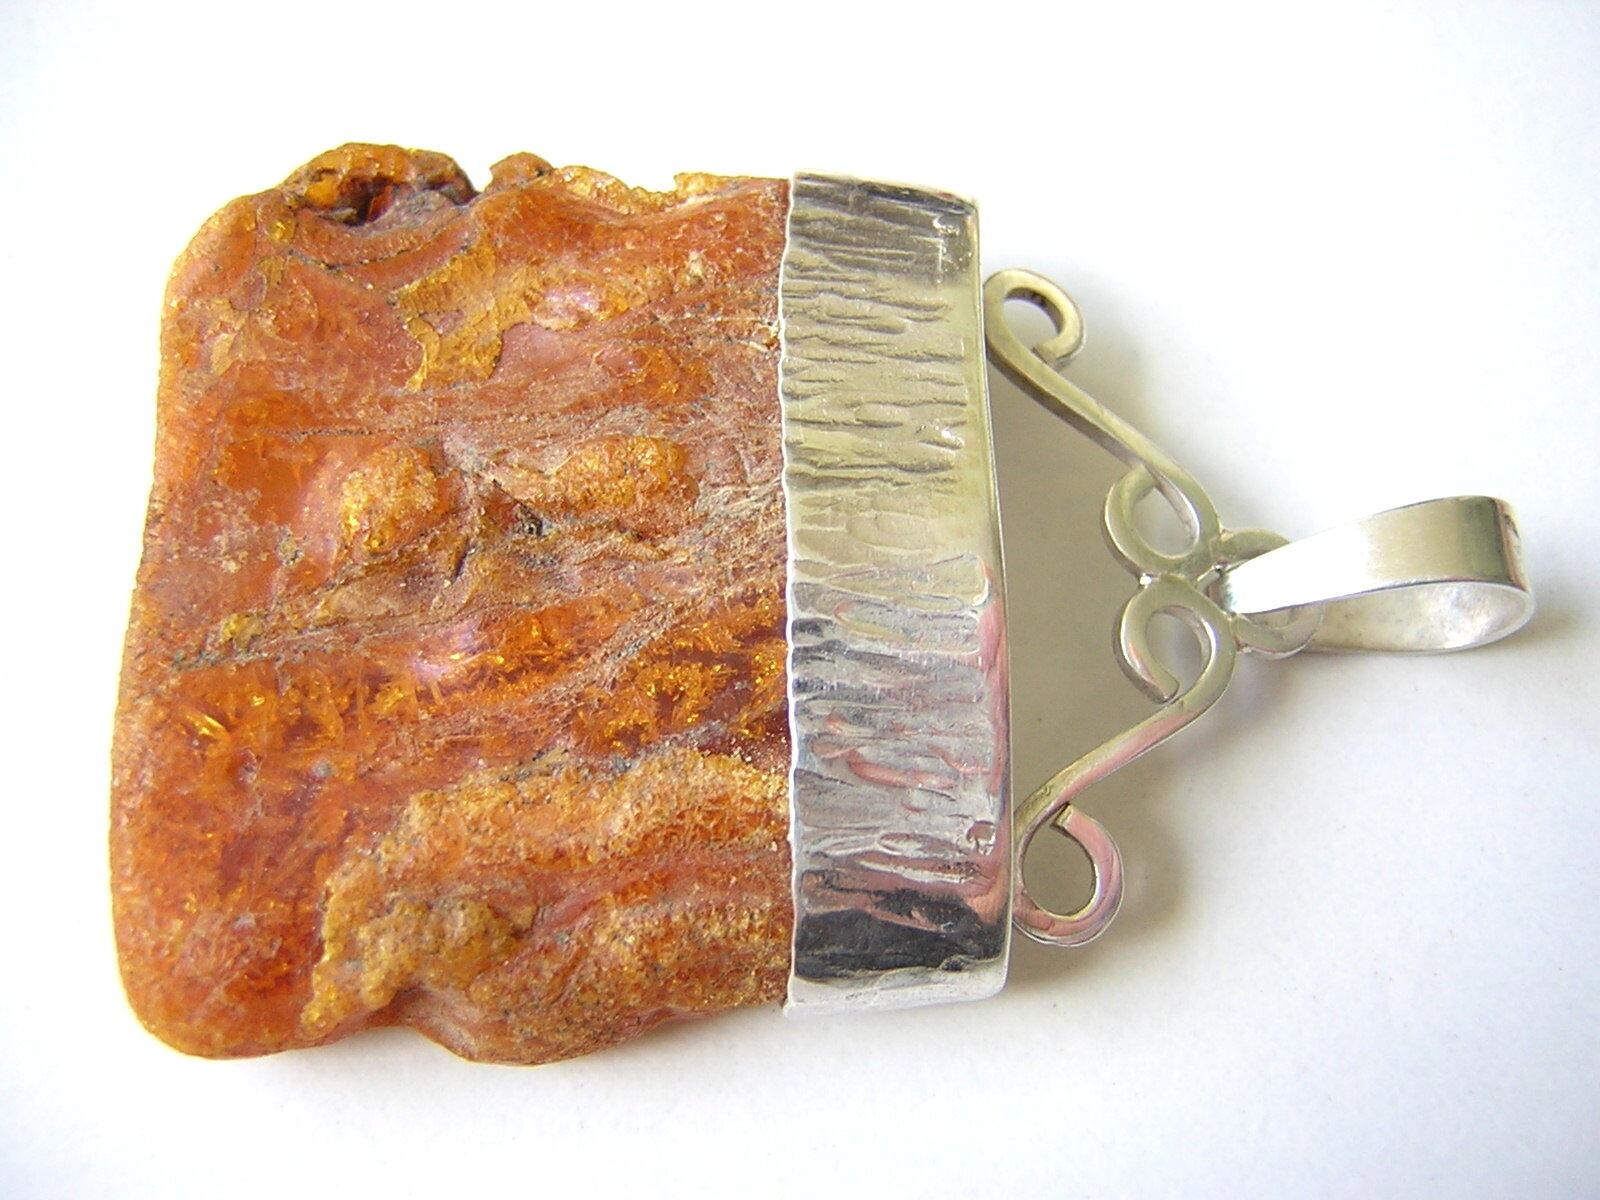 XL Roh Bernstein Charivari silver Anhänger Amber 12,5 g Juwelier-Handarbeit